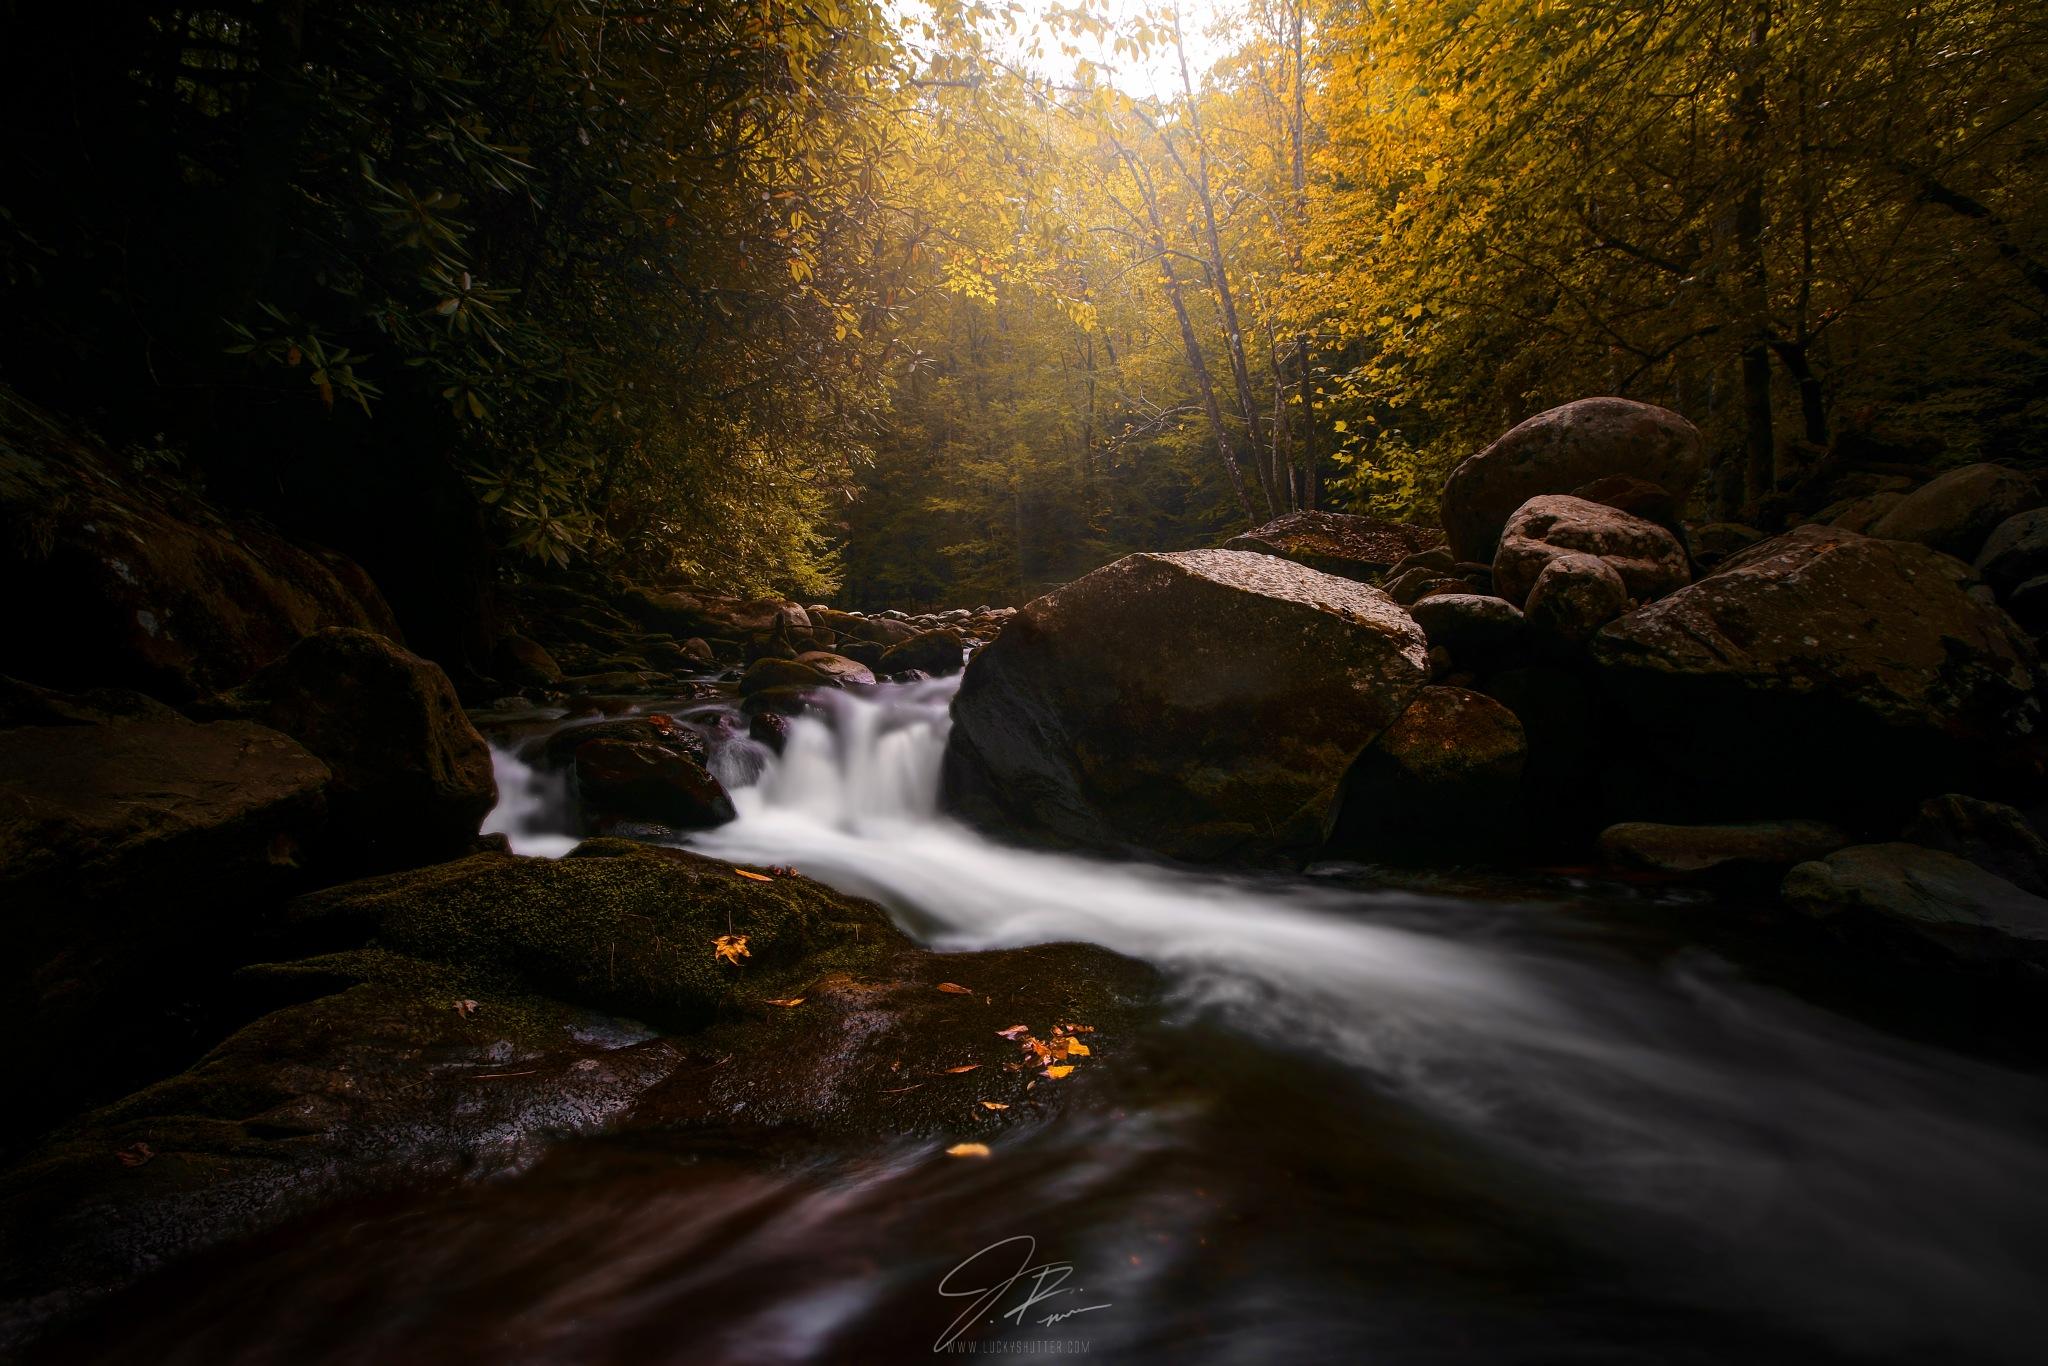 Smoky Mountain Days by Jesse R. Moran